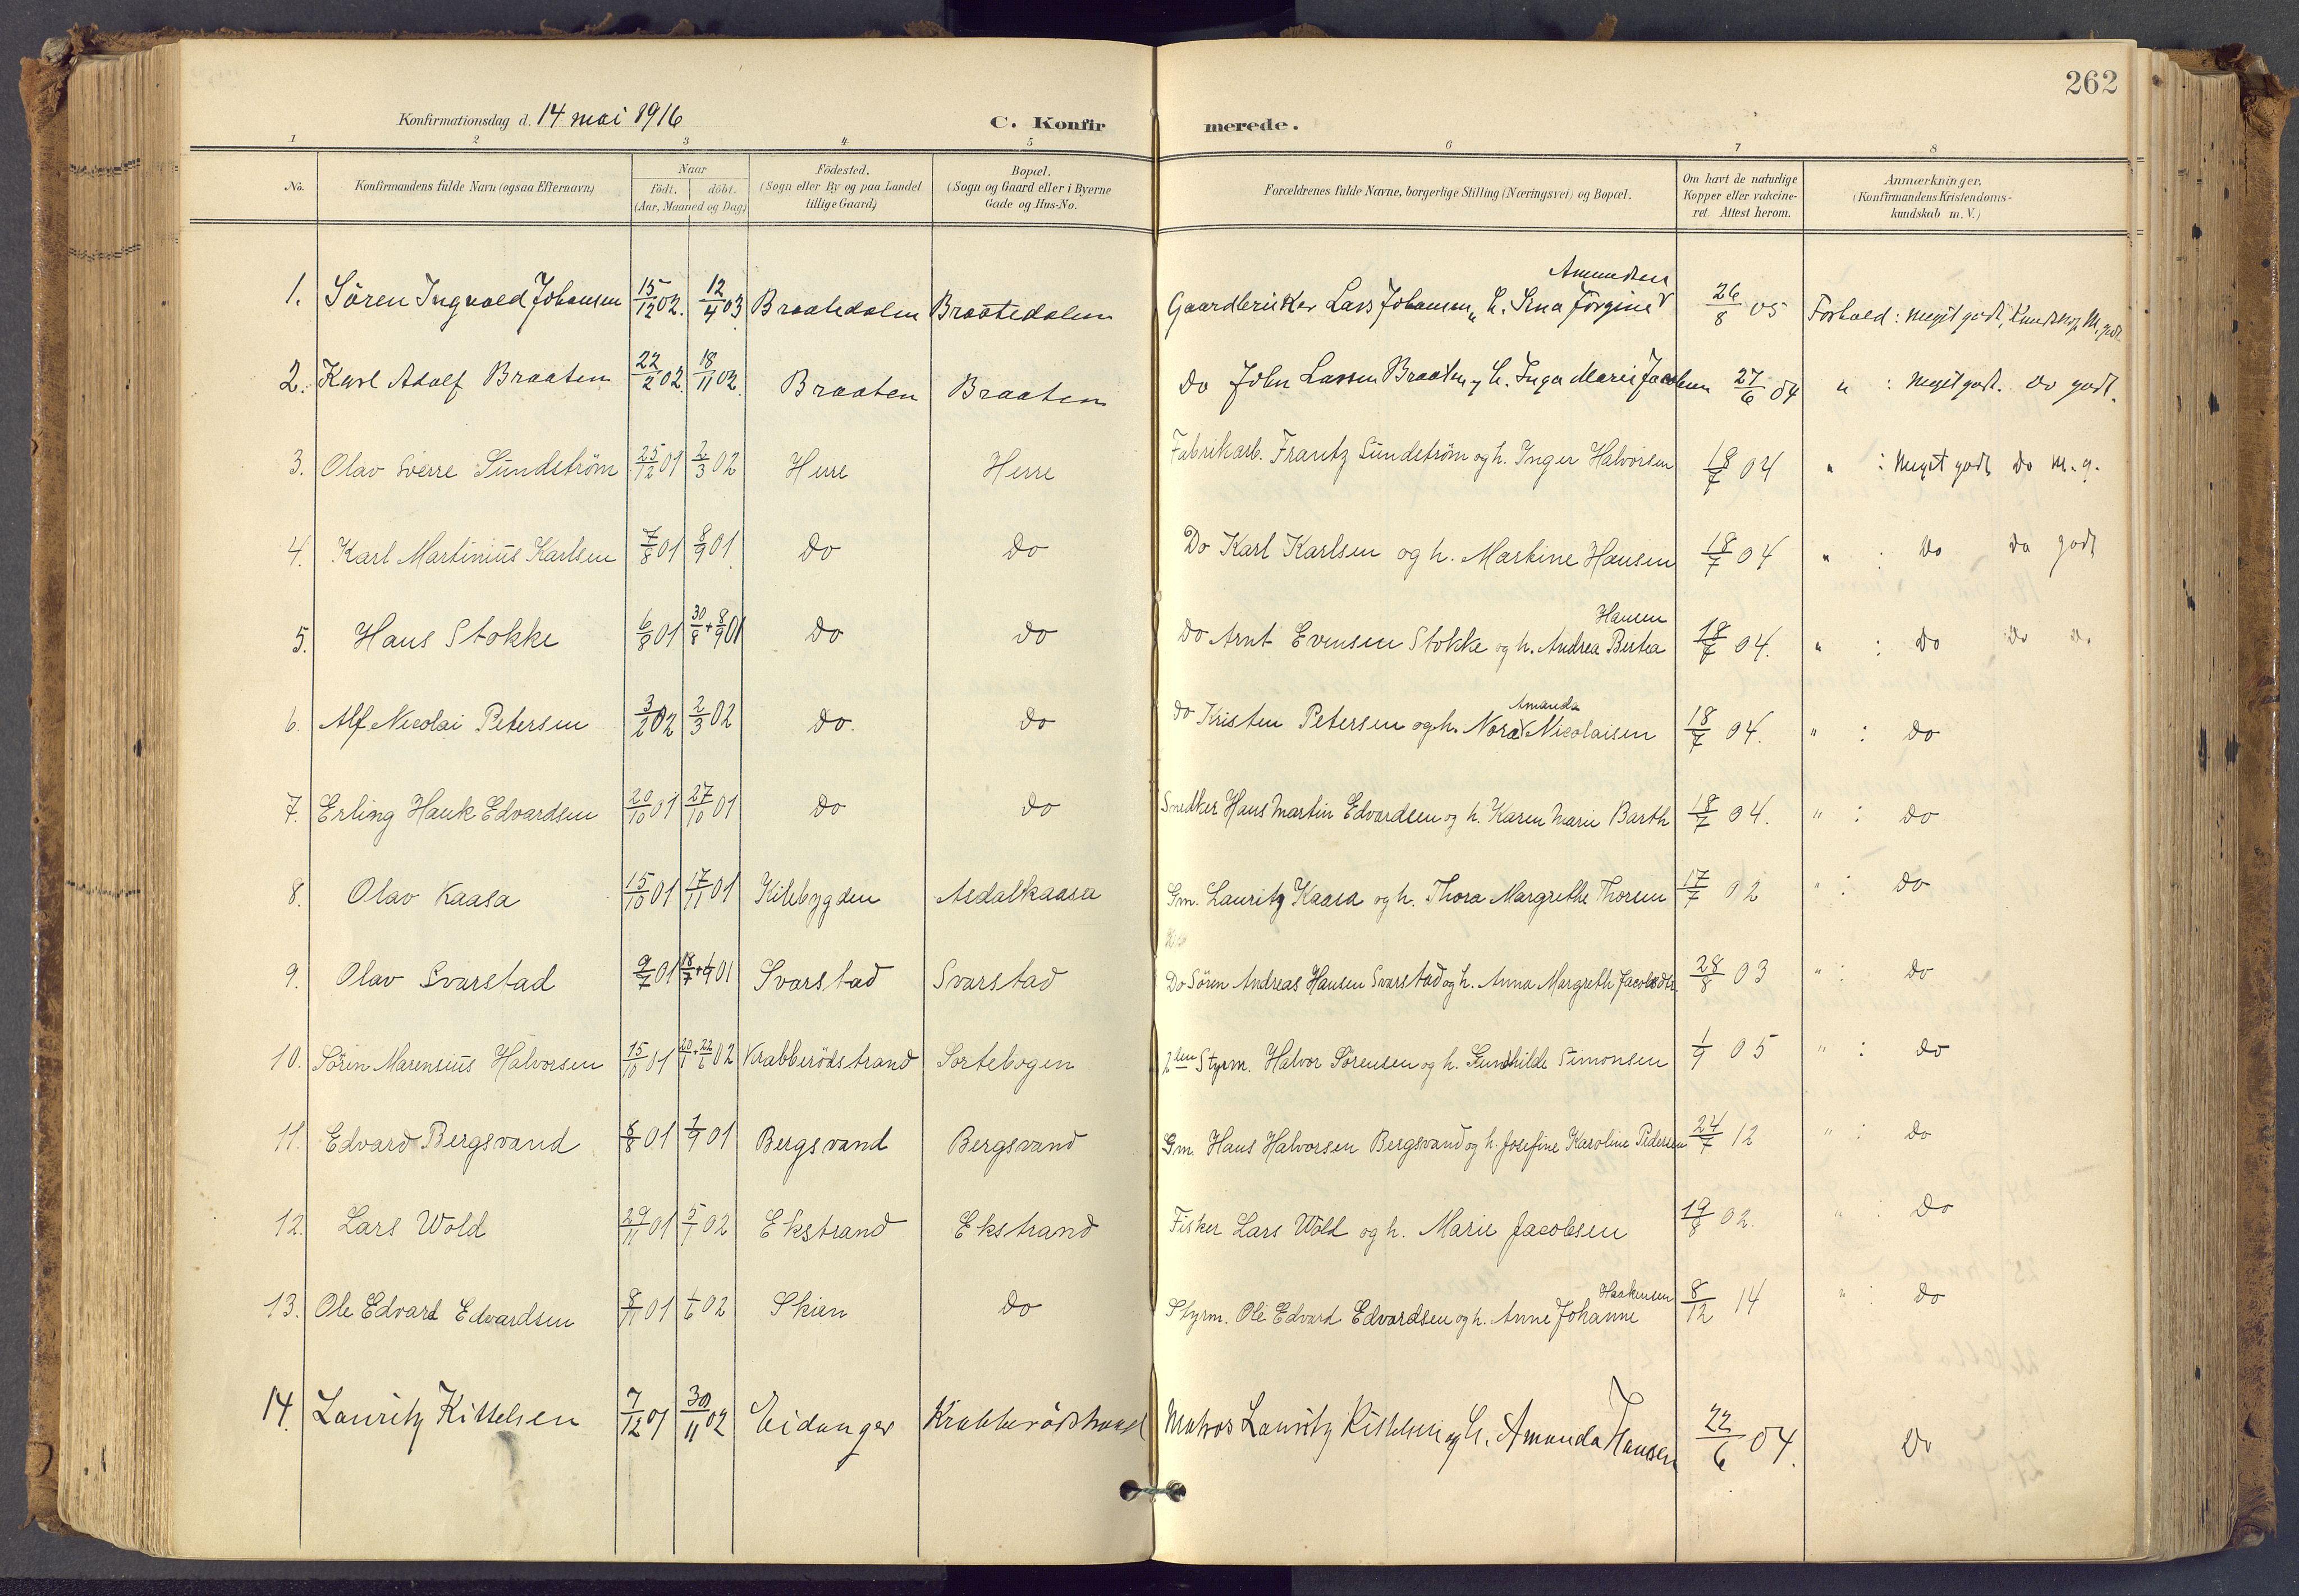 SAKO, Bamble kirkebøker, F/Fa/L0009: Ministerialbok nr. I 9, 1901-1917, s. 262